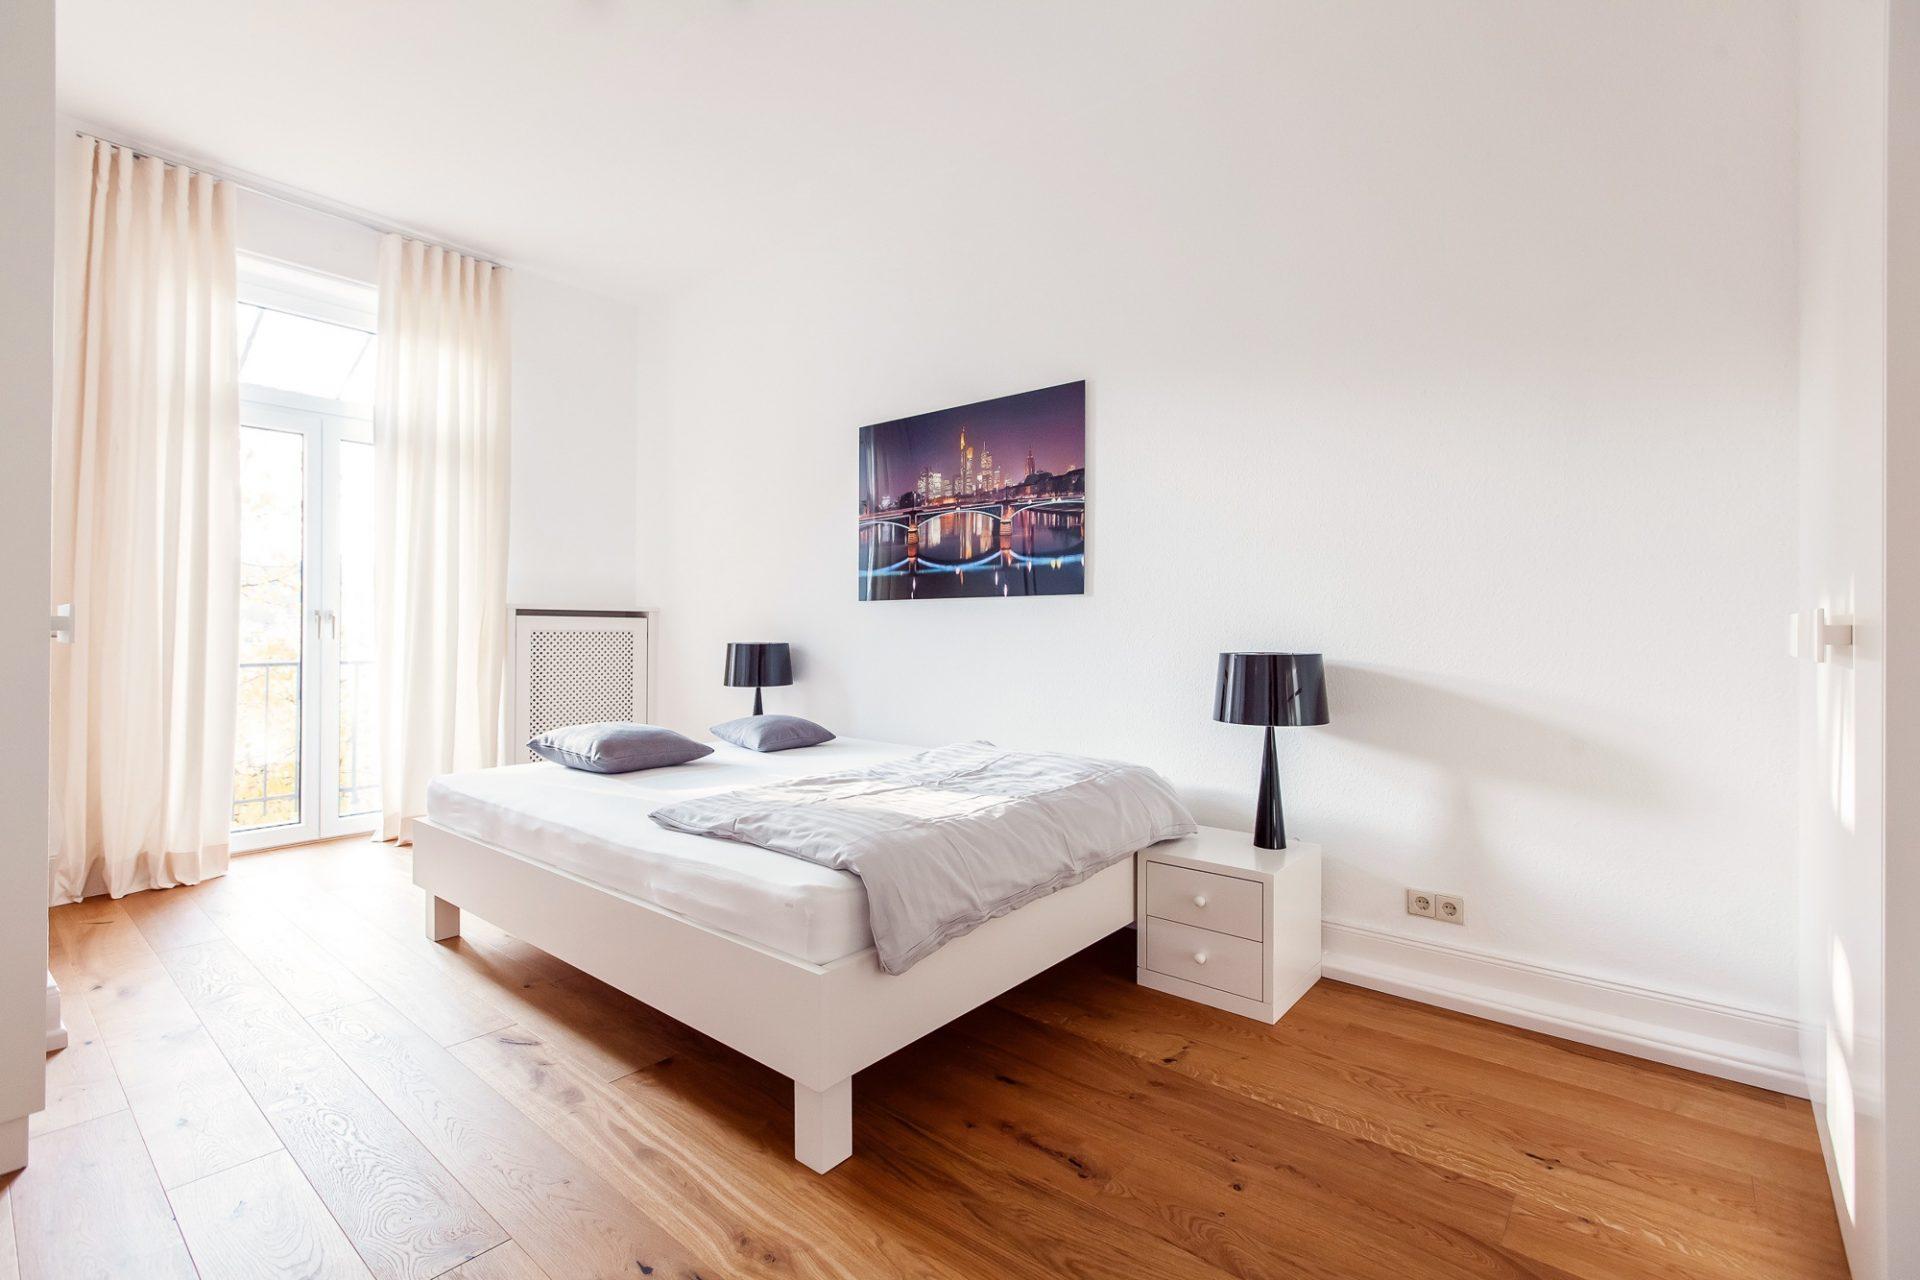 Immobilienfotograf Frankfurt ©Offenblende / Nikita